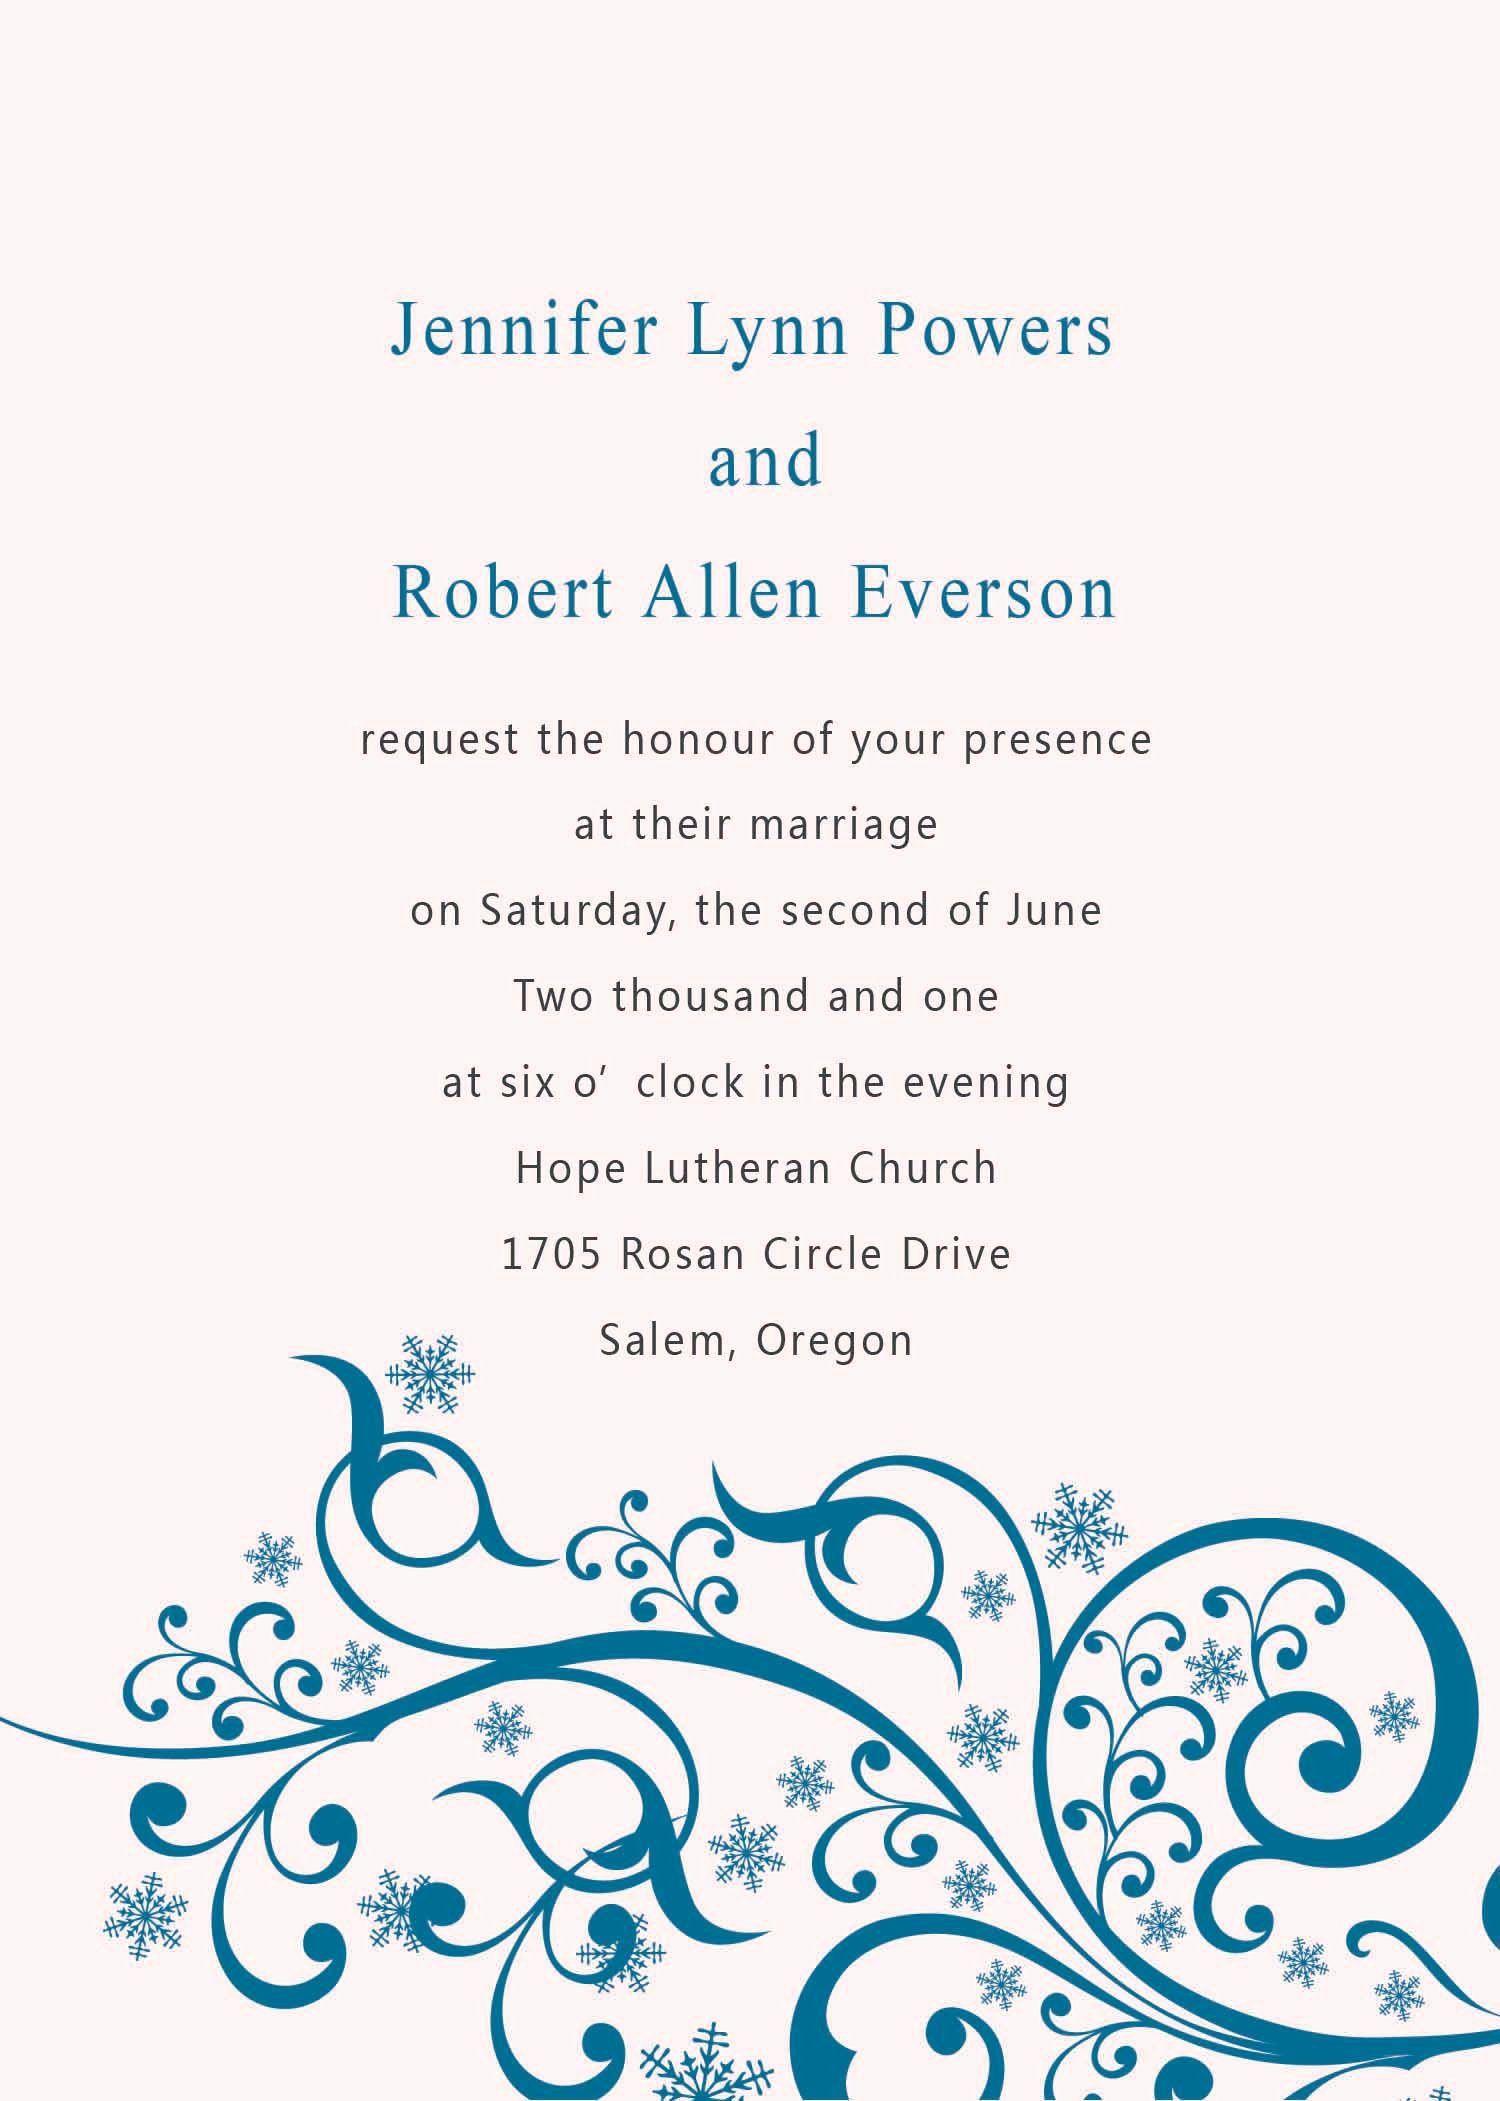 Word Wedding Invitation Template Beautiful Wedding Invita Wedding Invitation Card Template Modern Wedding Invitation Wording Free Printable Wedding Invitations